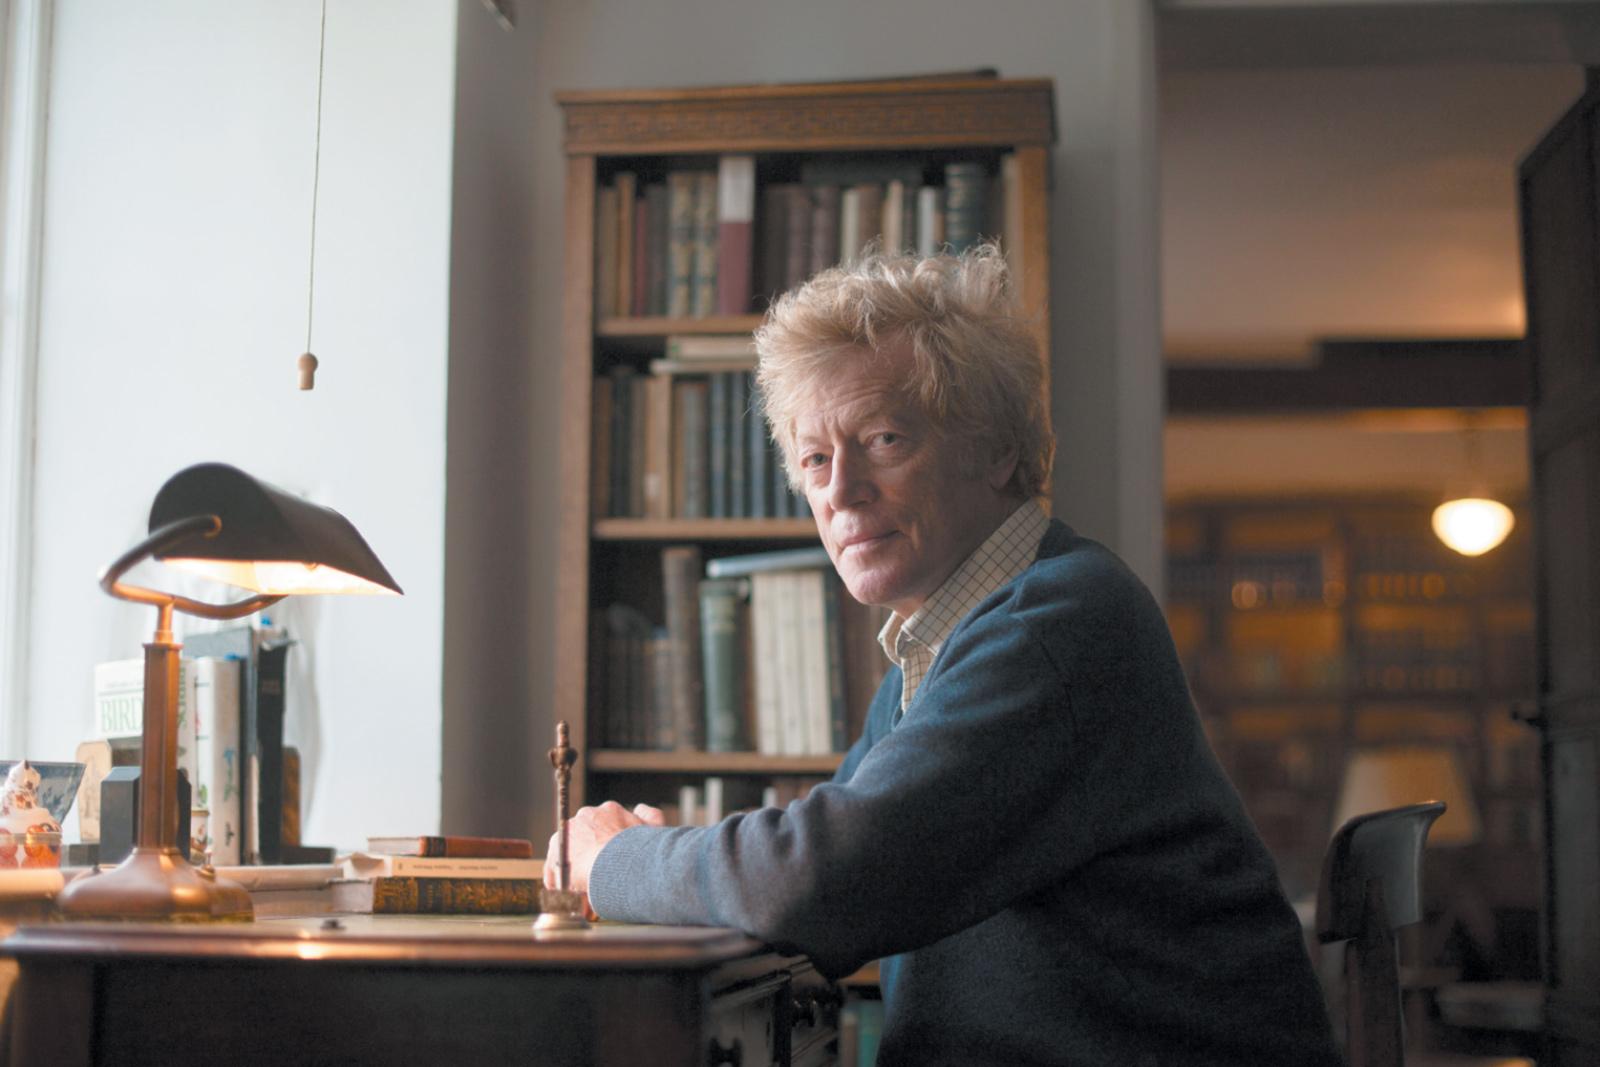 Remembering Sir Roger Scruton